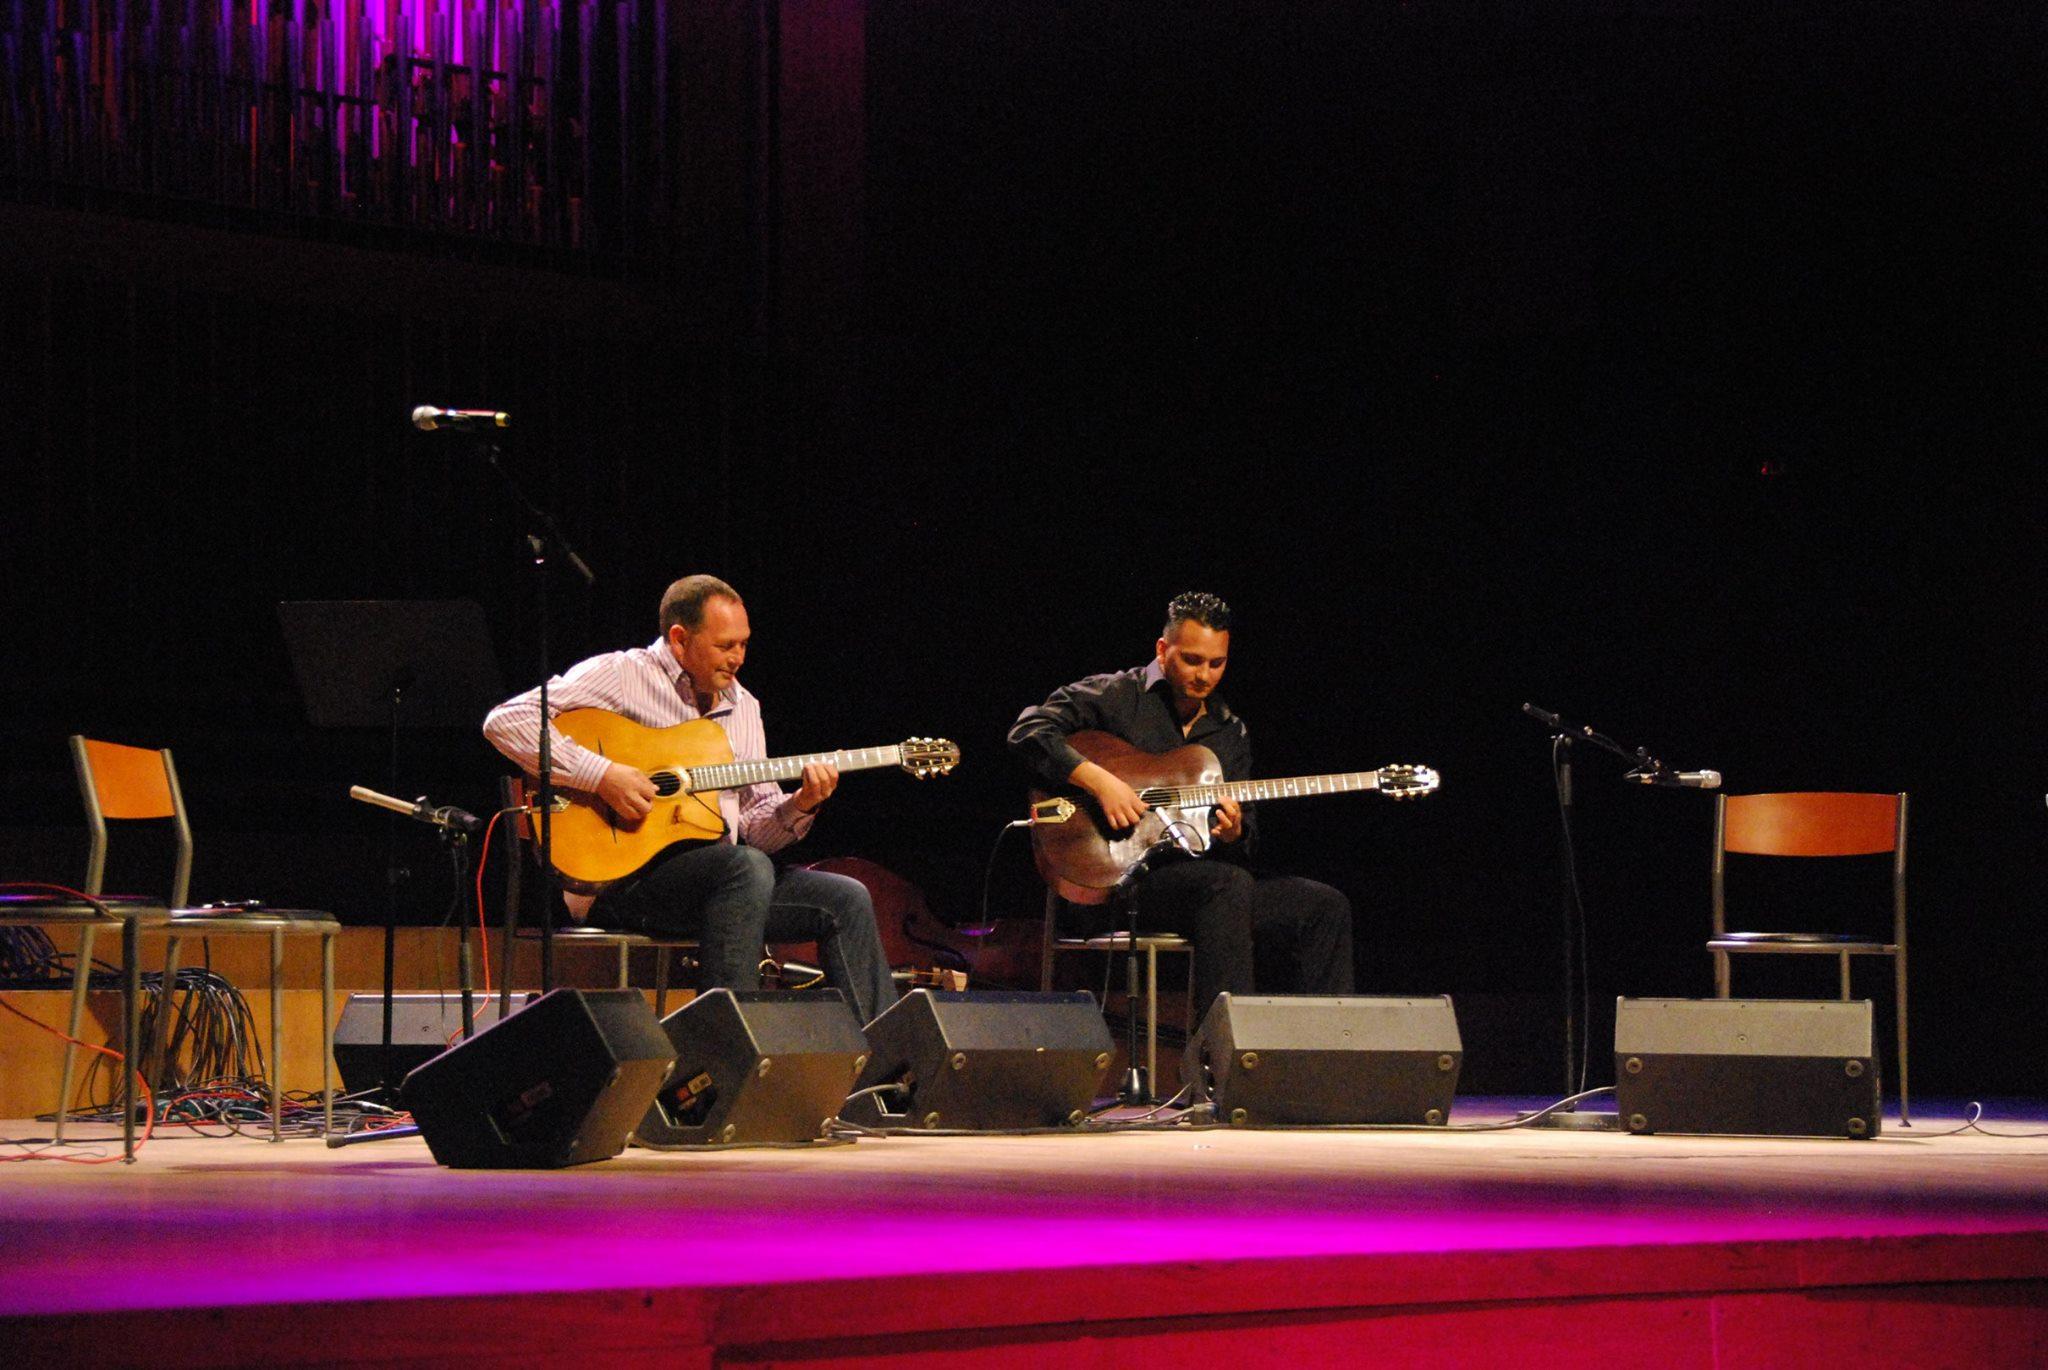 All-Stars-Gypsy-Band-presents-Django-Reinhardt-Legacy-Project_Vatroslav_Lisinski_2